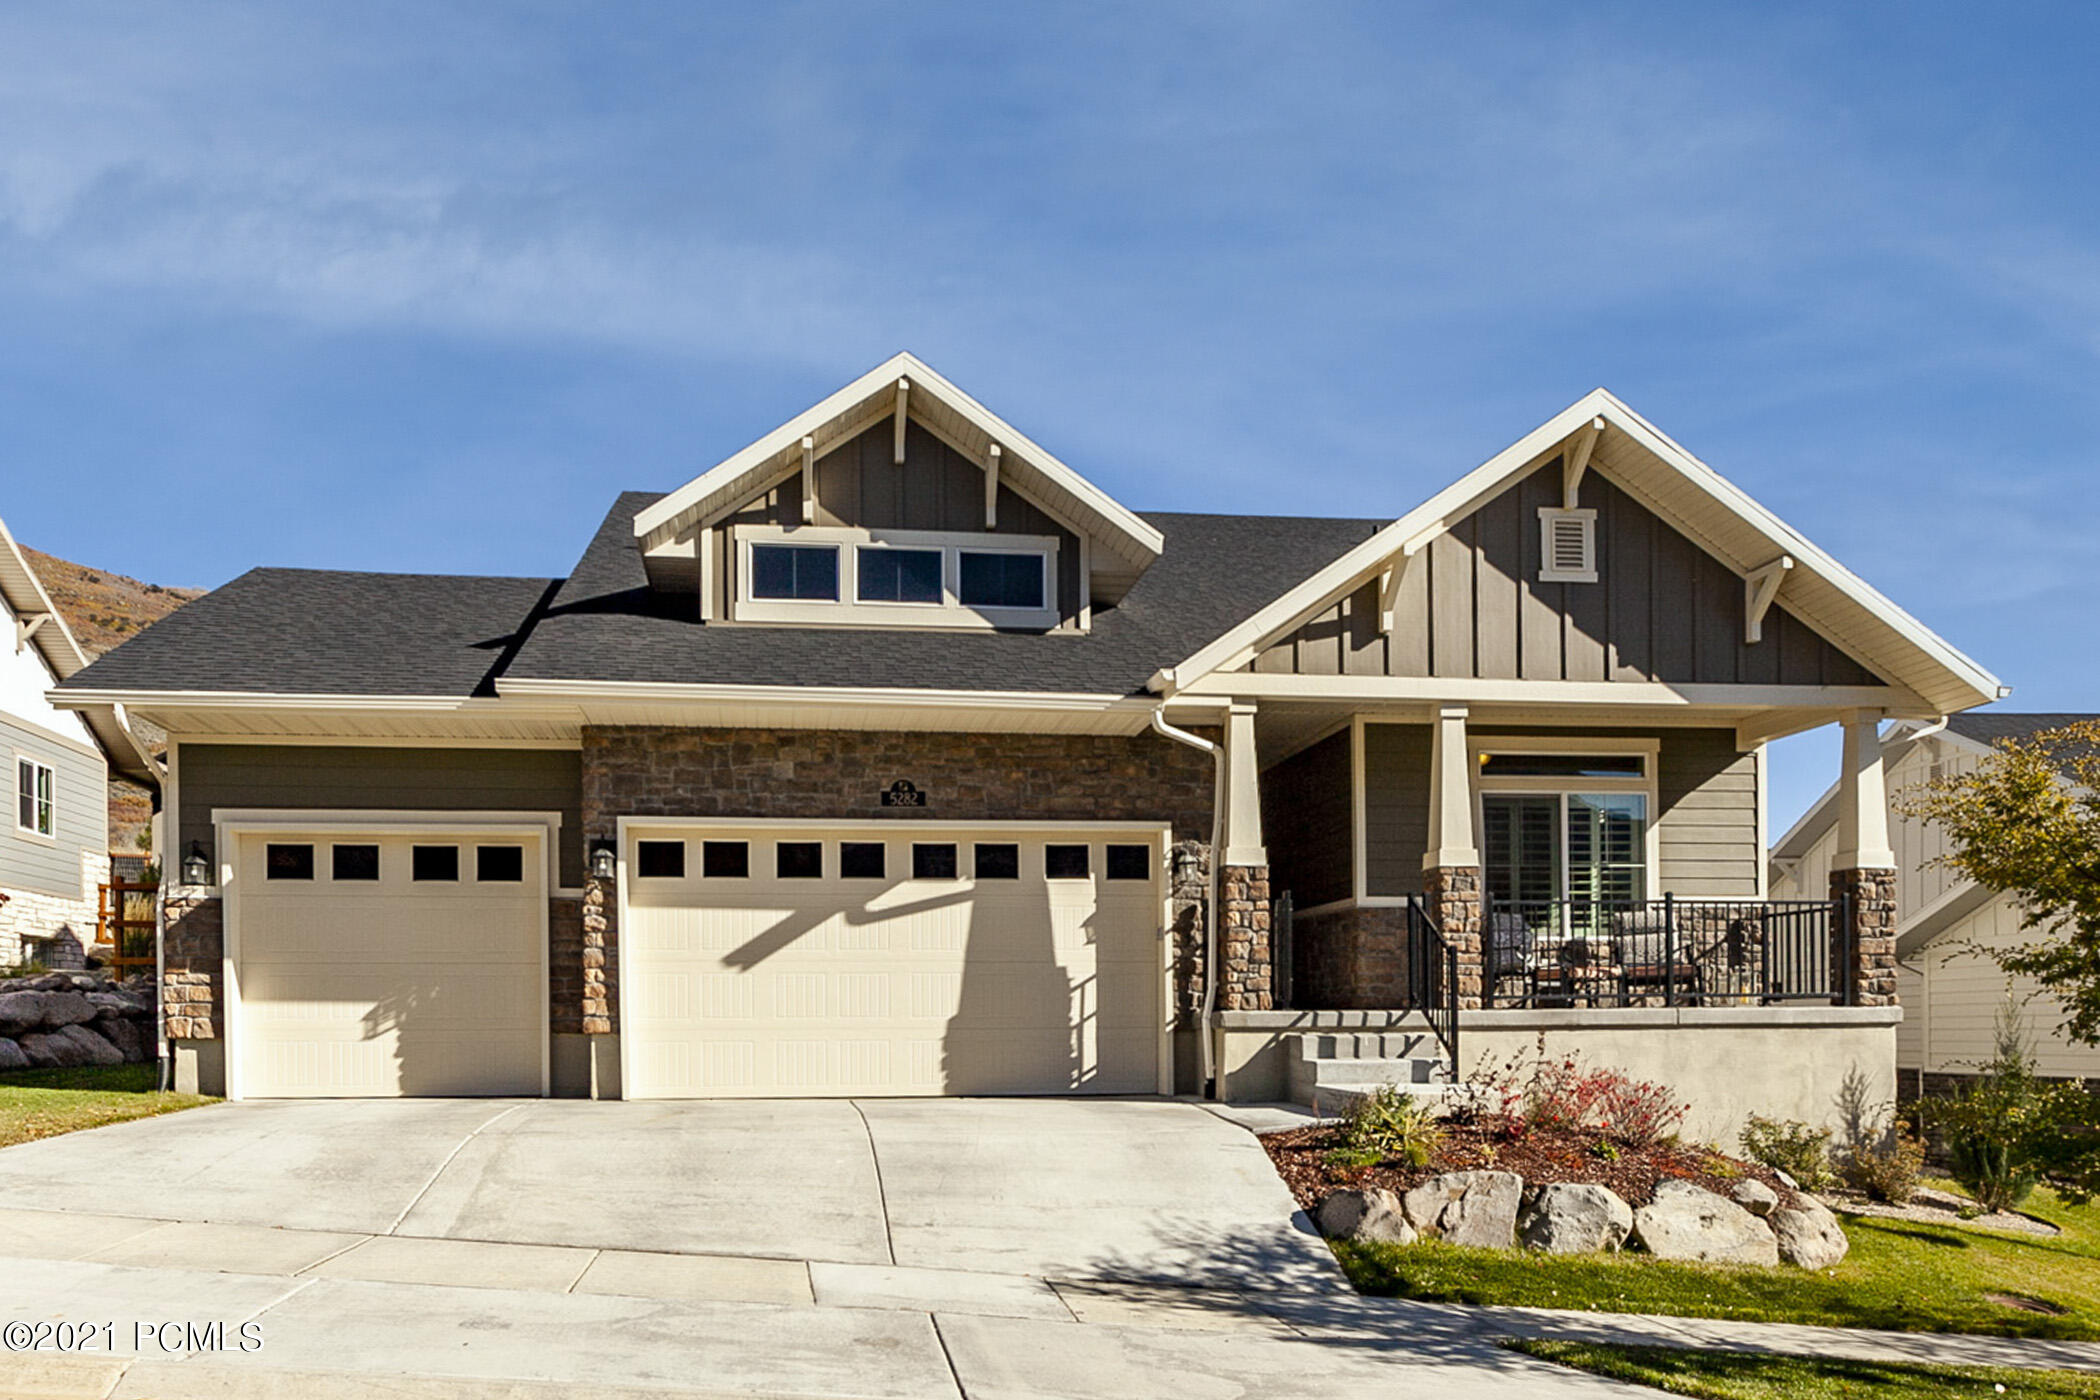 5282 Oldgate Road, Heber City, Utah 84032, 4 Bedrooms Bedrooms, ,4 BathroomsBathrooms,Single Family,For Sale,Oldgate,12104261